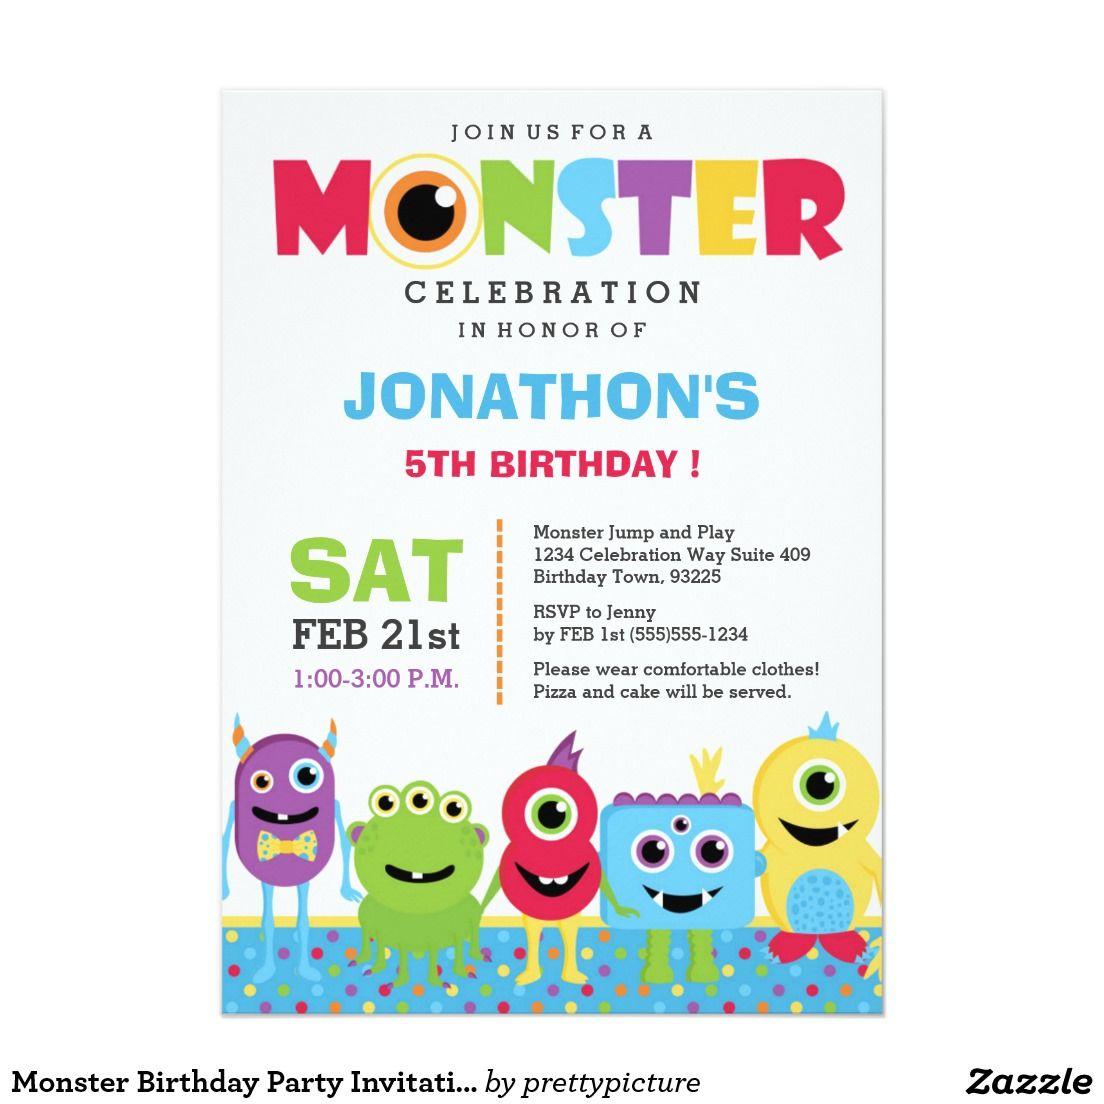 Monster Birthday Party Invitation | Party invitations, Zazzle ...